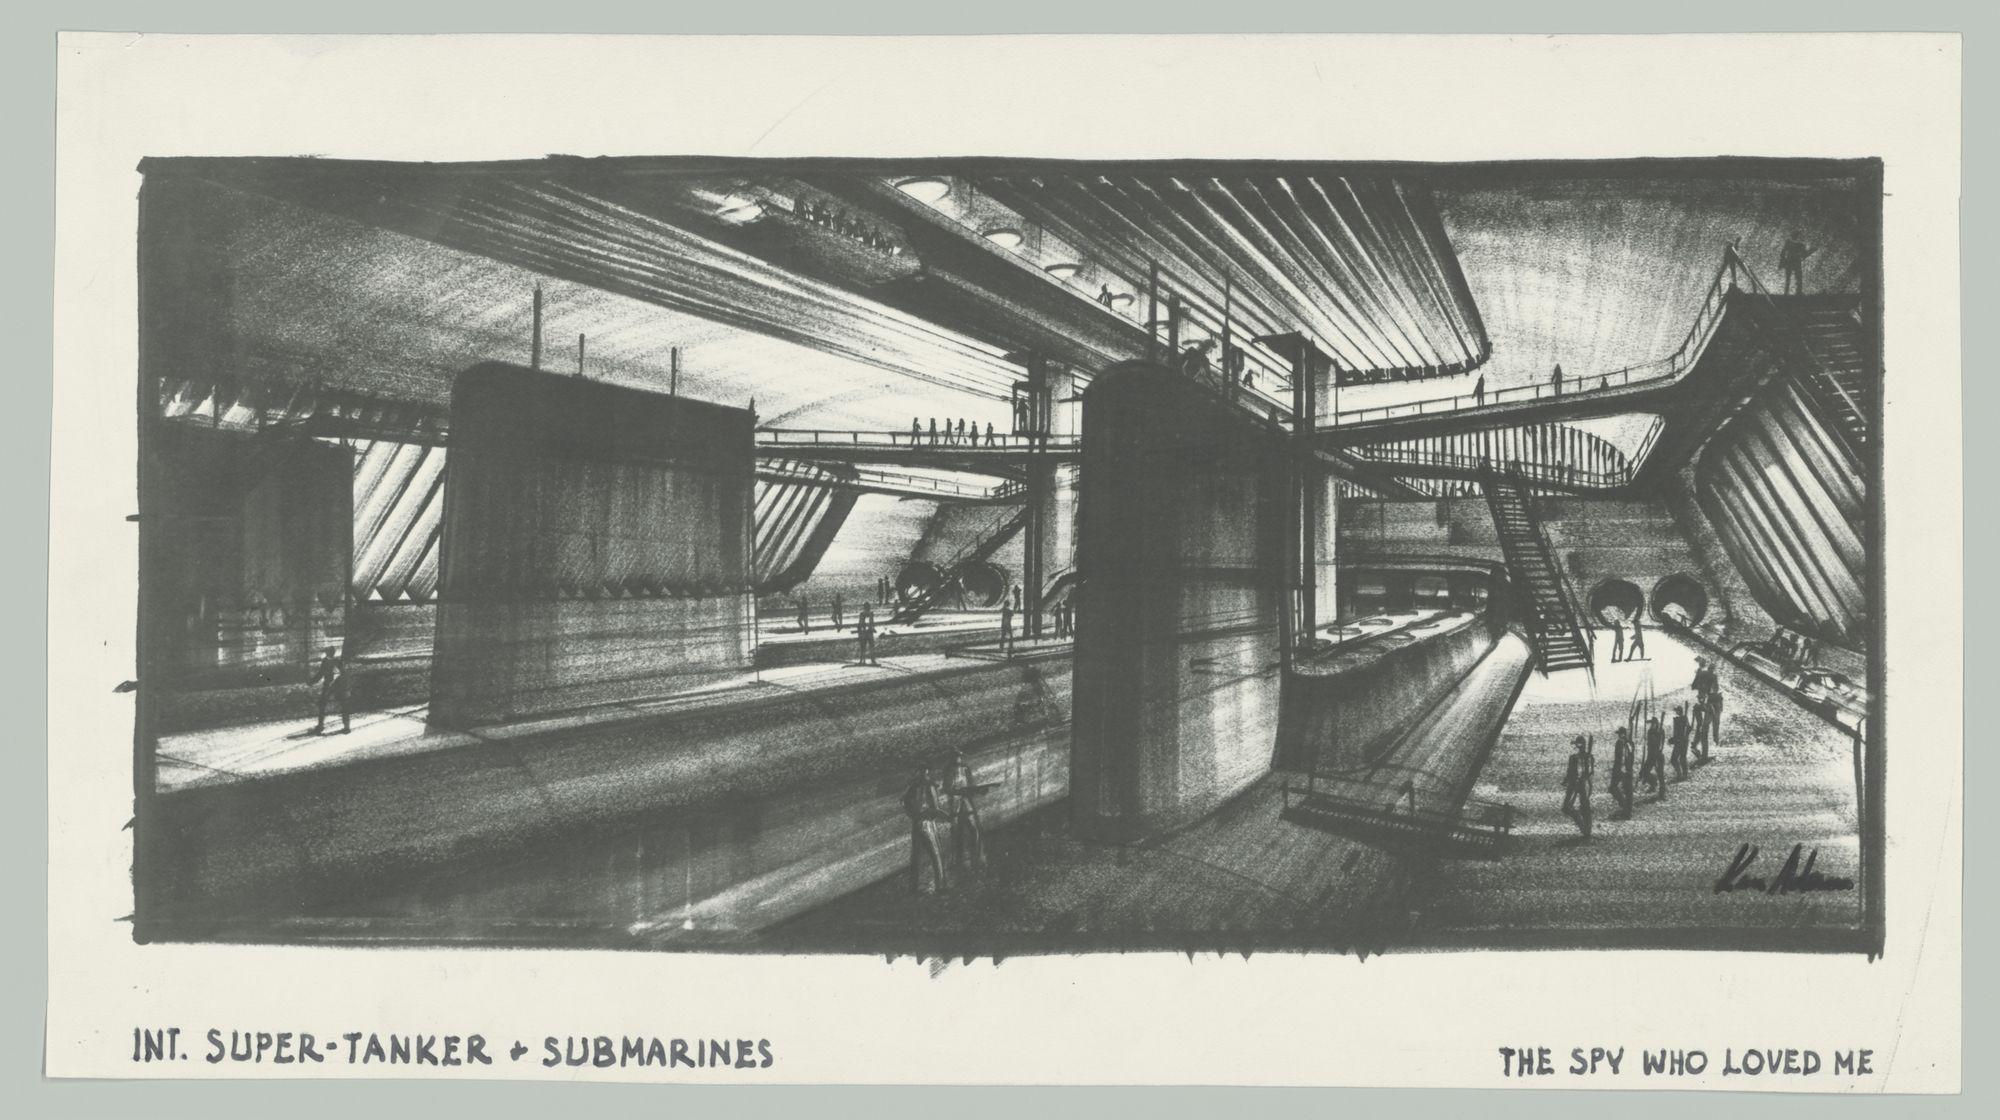 5494993de58ece9bf40000a7_meet-the-film-industry-s-most-successful-architect-in-deutsche-kinemathek-s-latest-exhibition_sdk_08_20140910_1027ka_supertank.jpg (2000×1120)